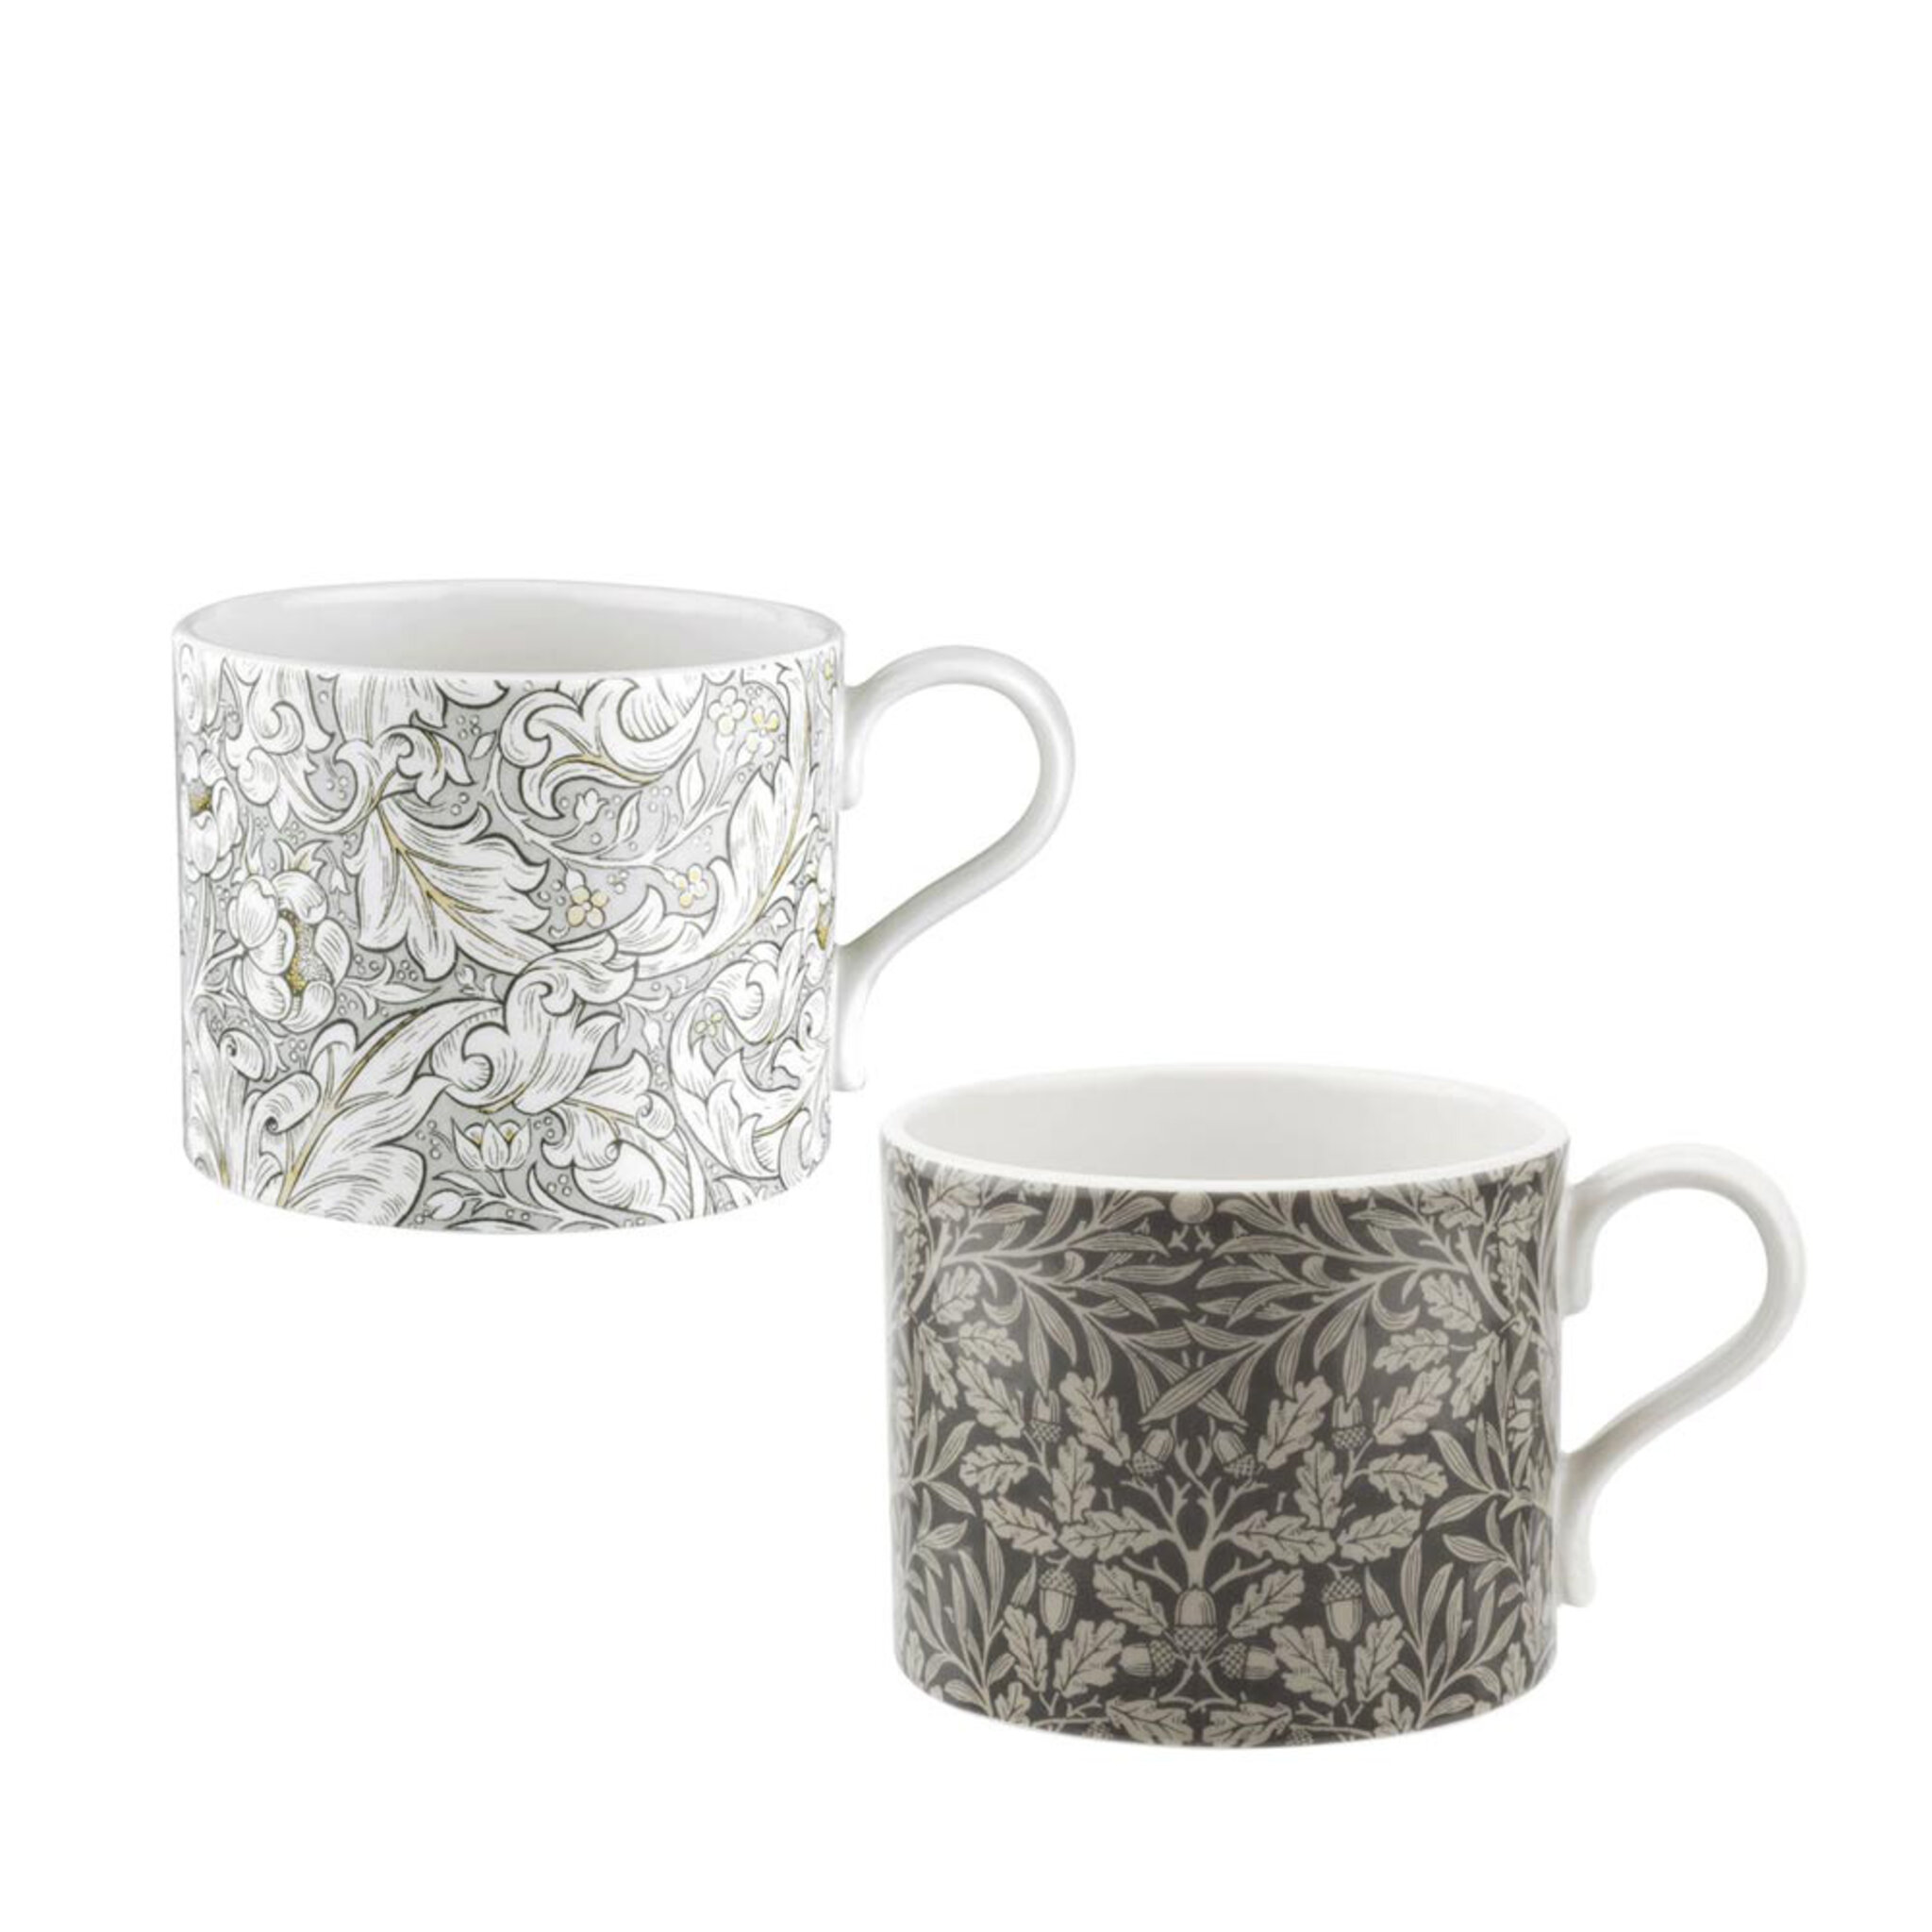 Pure Morris Mugs – Bachelors & Acorn set 034L 2-pack